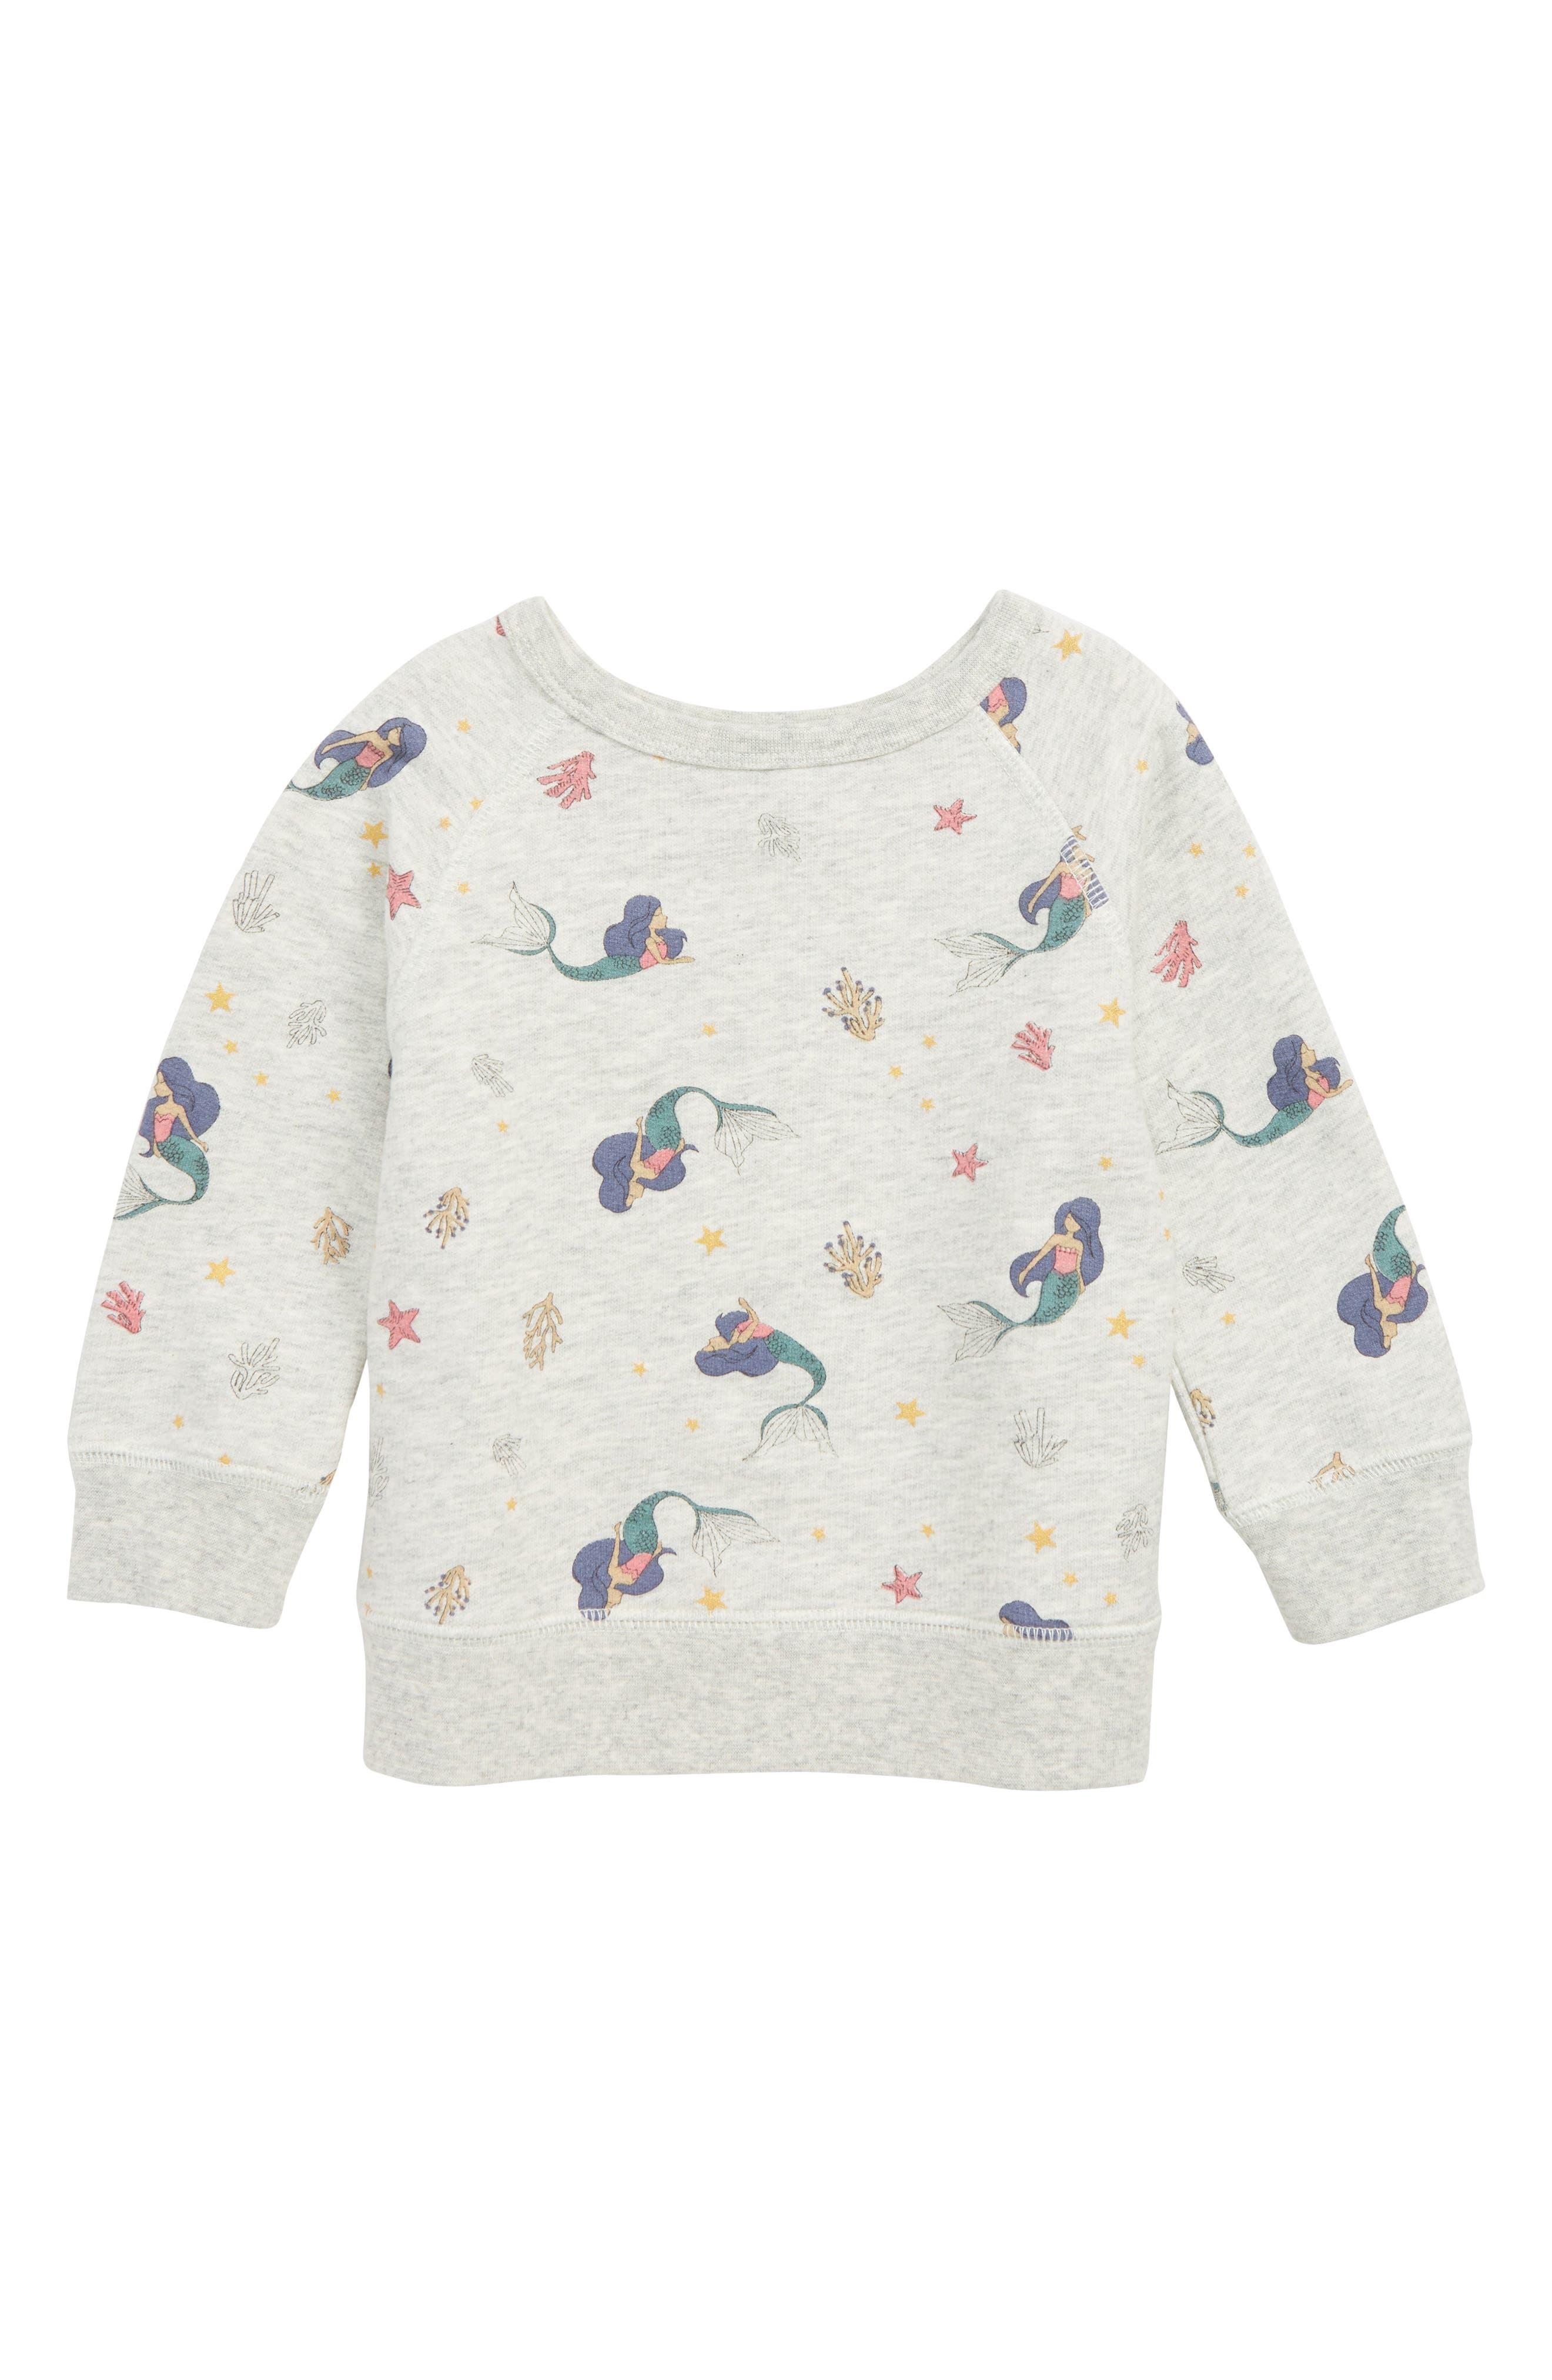 PEEK AREN'T YOU CURIOUS Mermaid Graphic Sweatshirt, Main, color, 277